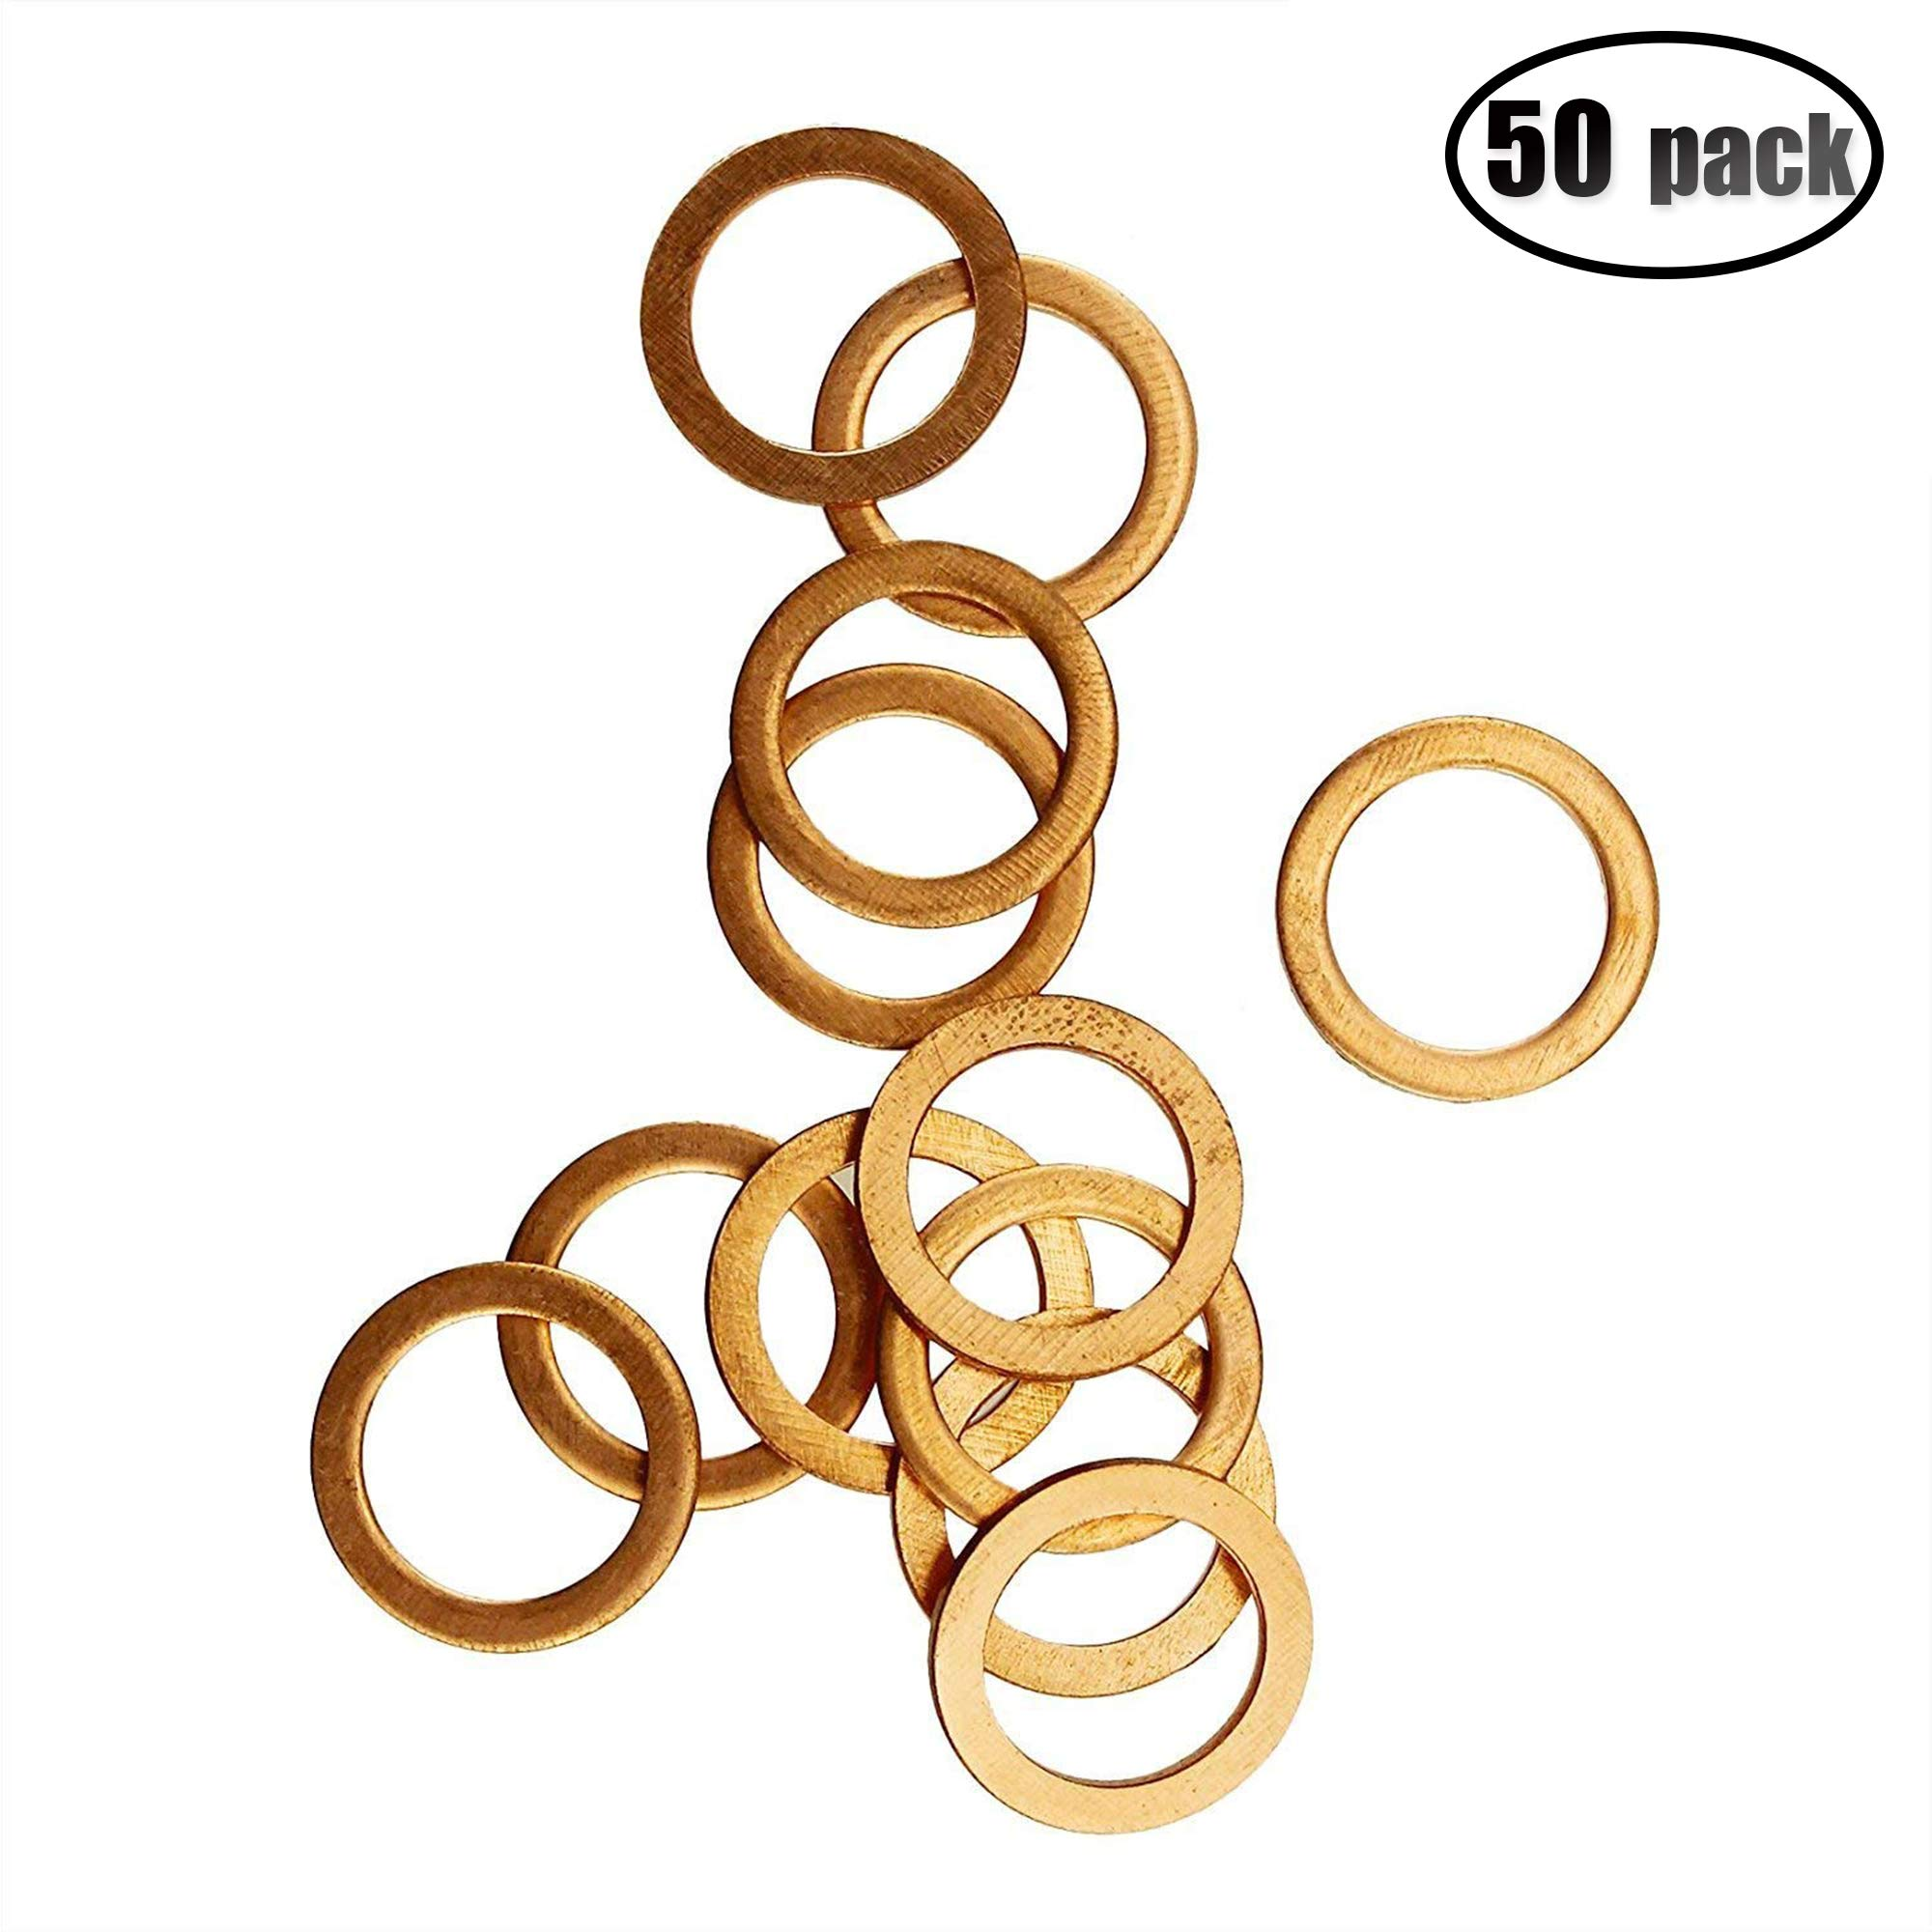 IZTOSS 50Pcs Copper Metric Flat Sealing Washers M14x20x1.5mm